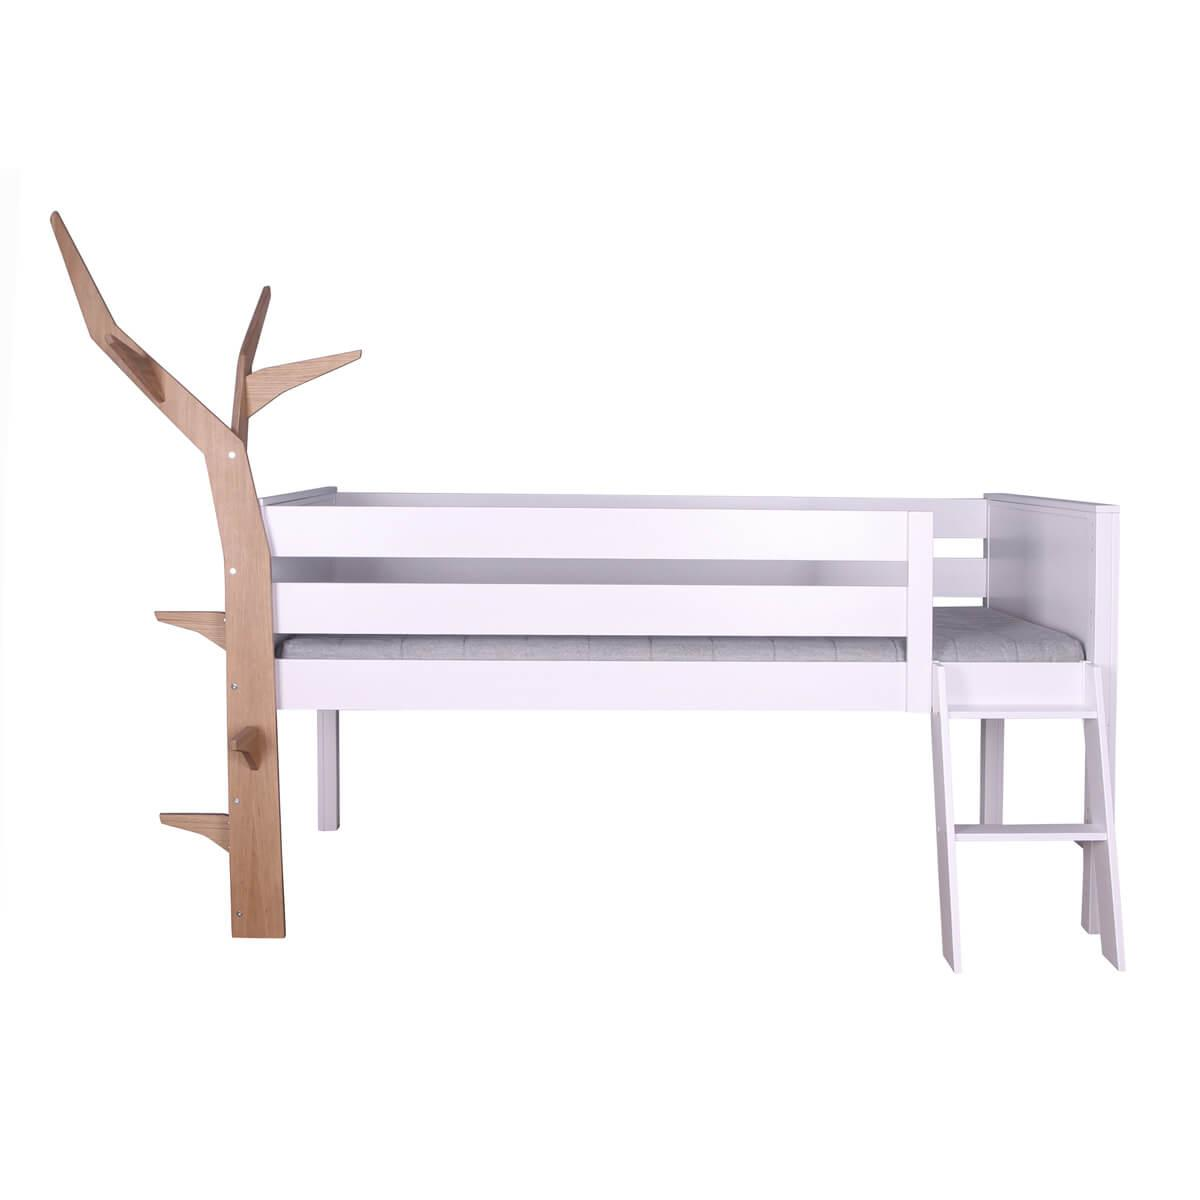 Hochbett-Baum halbhoch KASVA Buche massiv weiß-lackiert  Eiche furniert-geölt